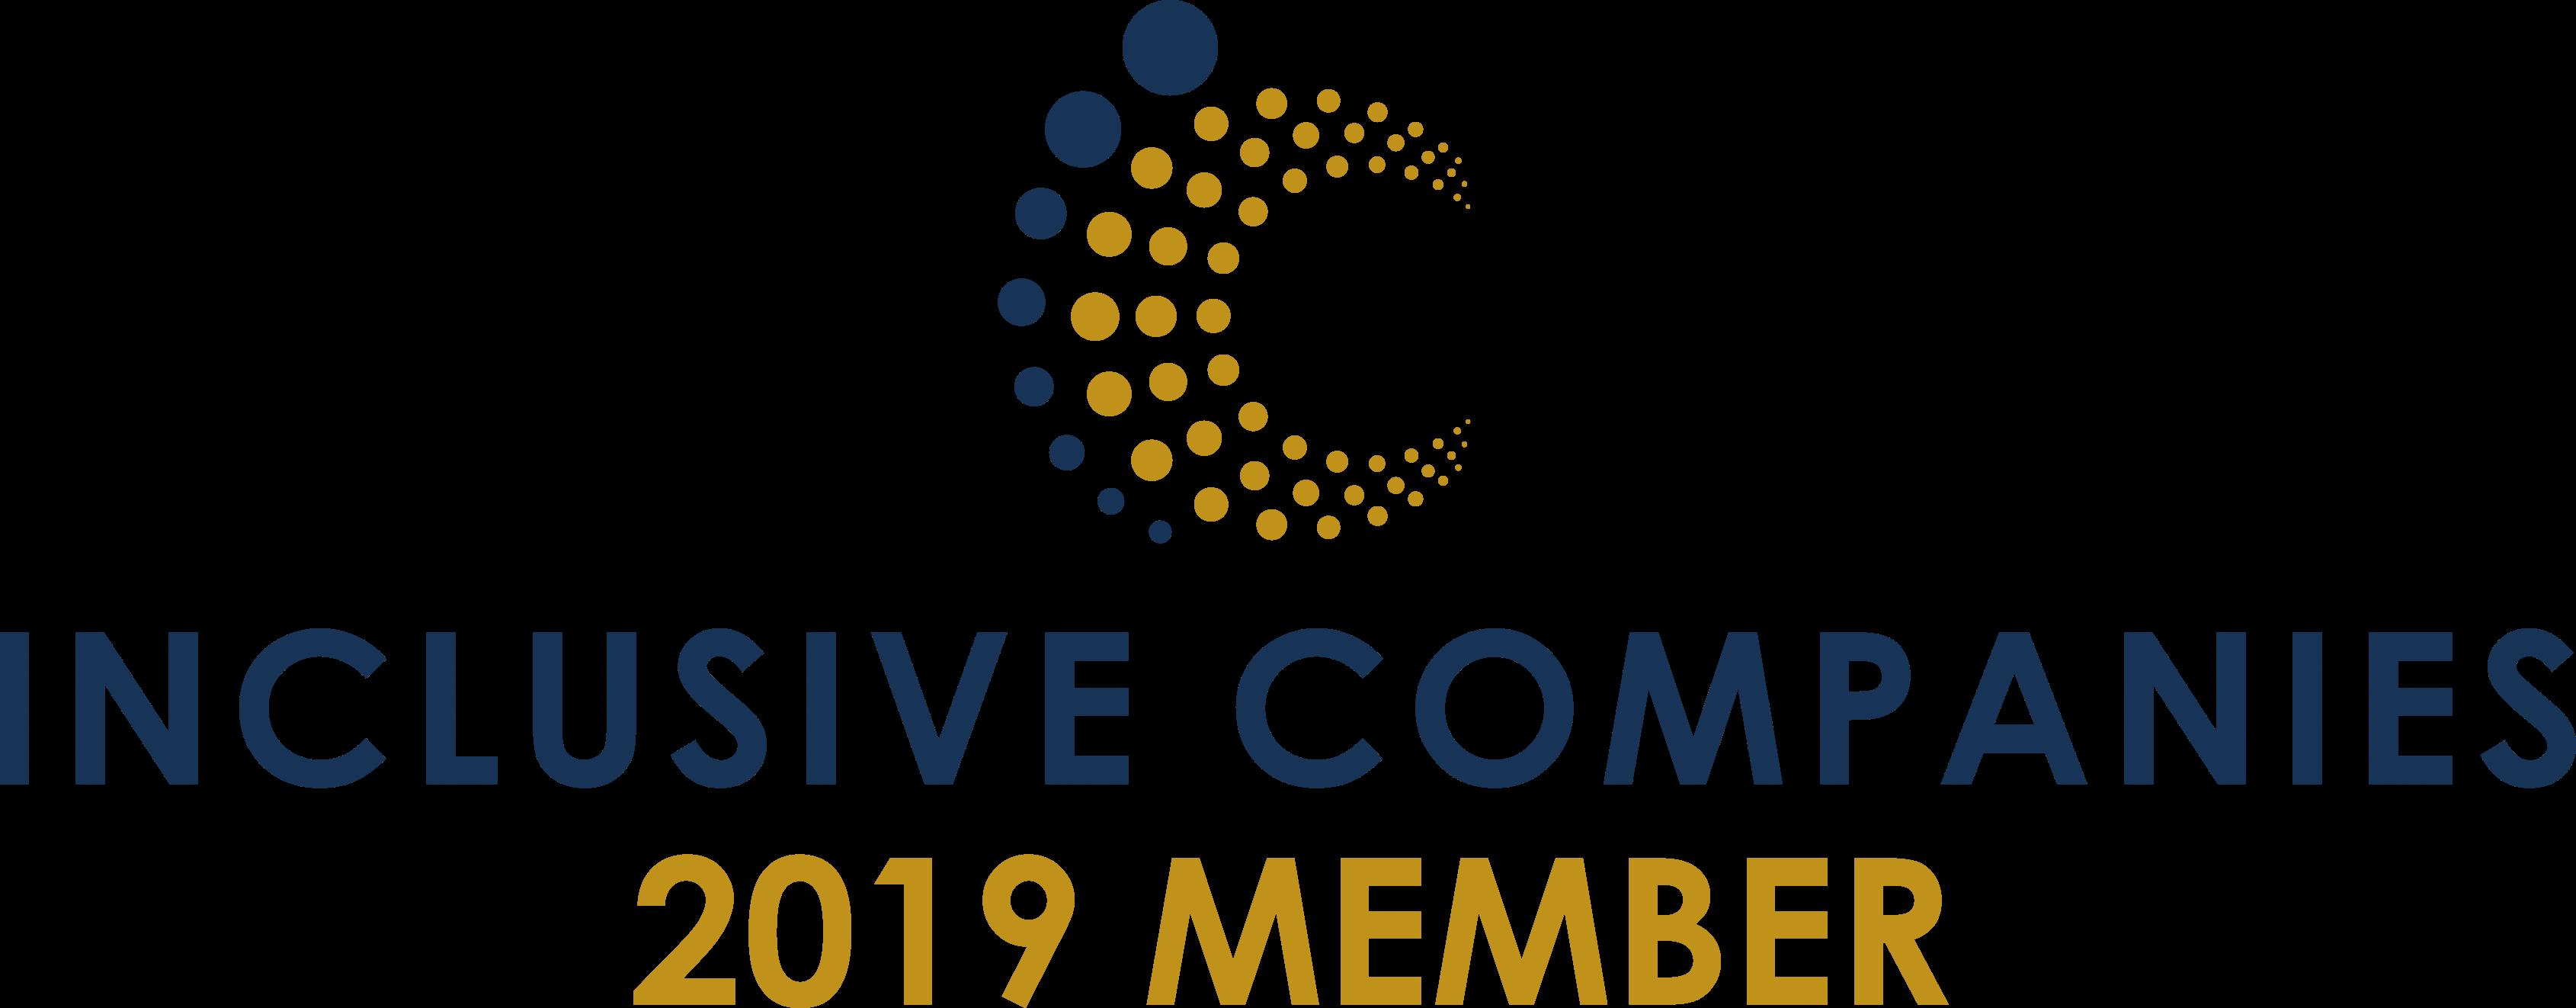 Inclusive Companies Logo